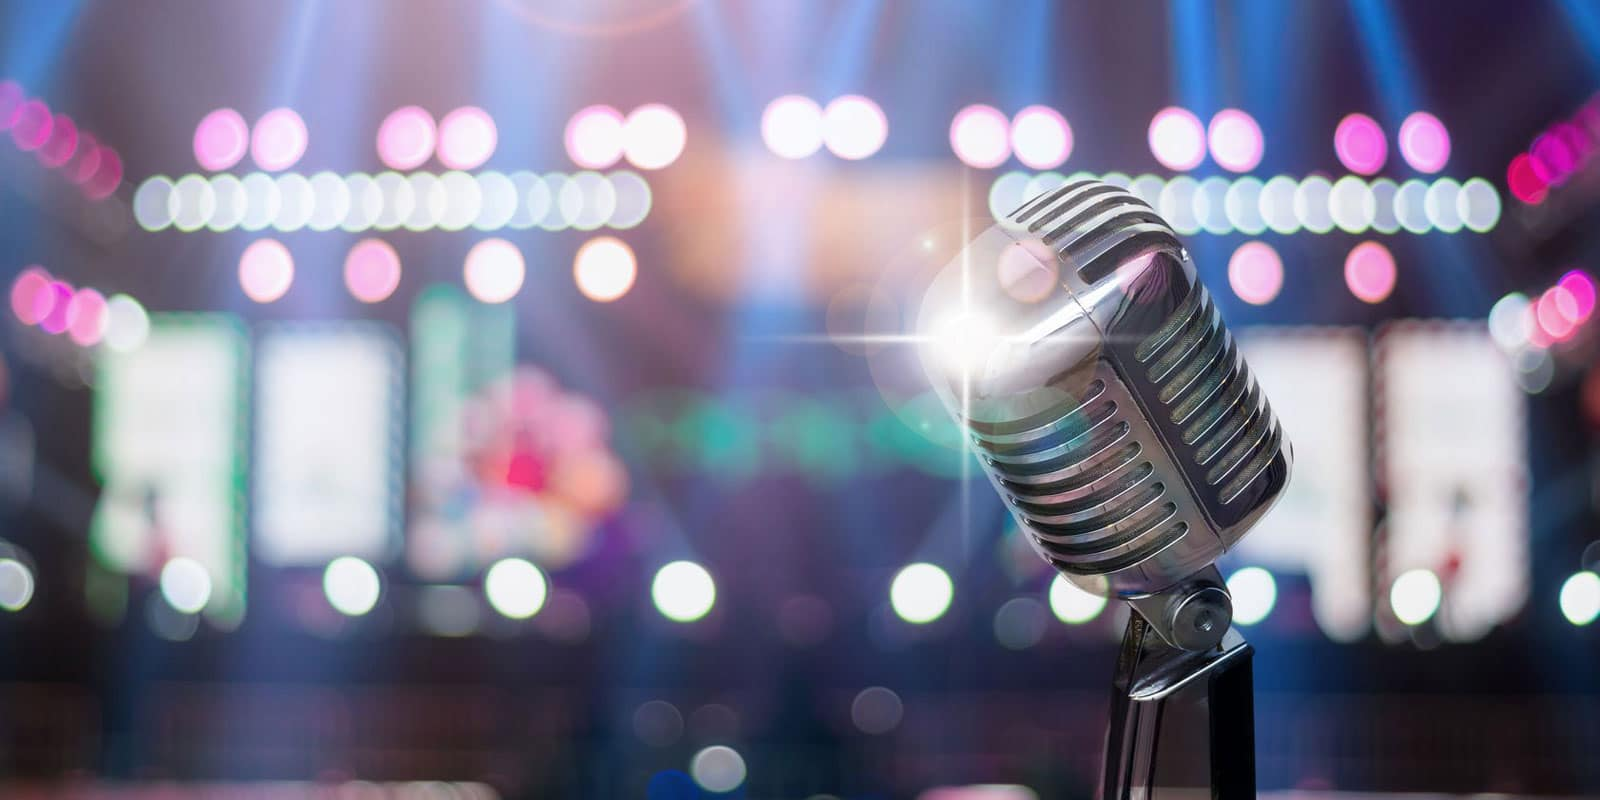 Microfone in the spotlights